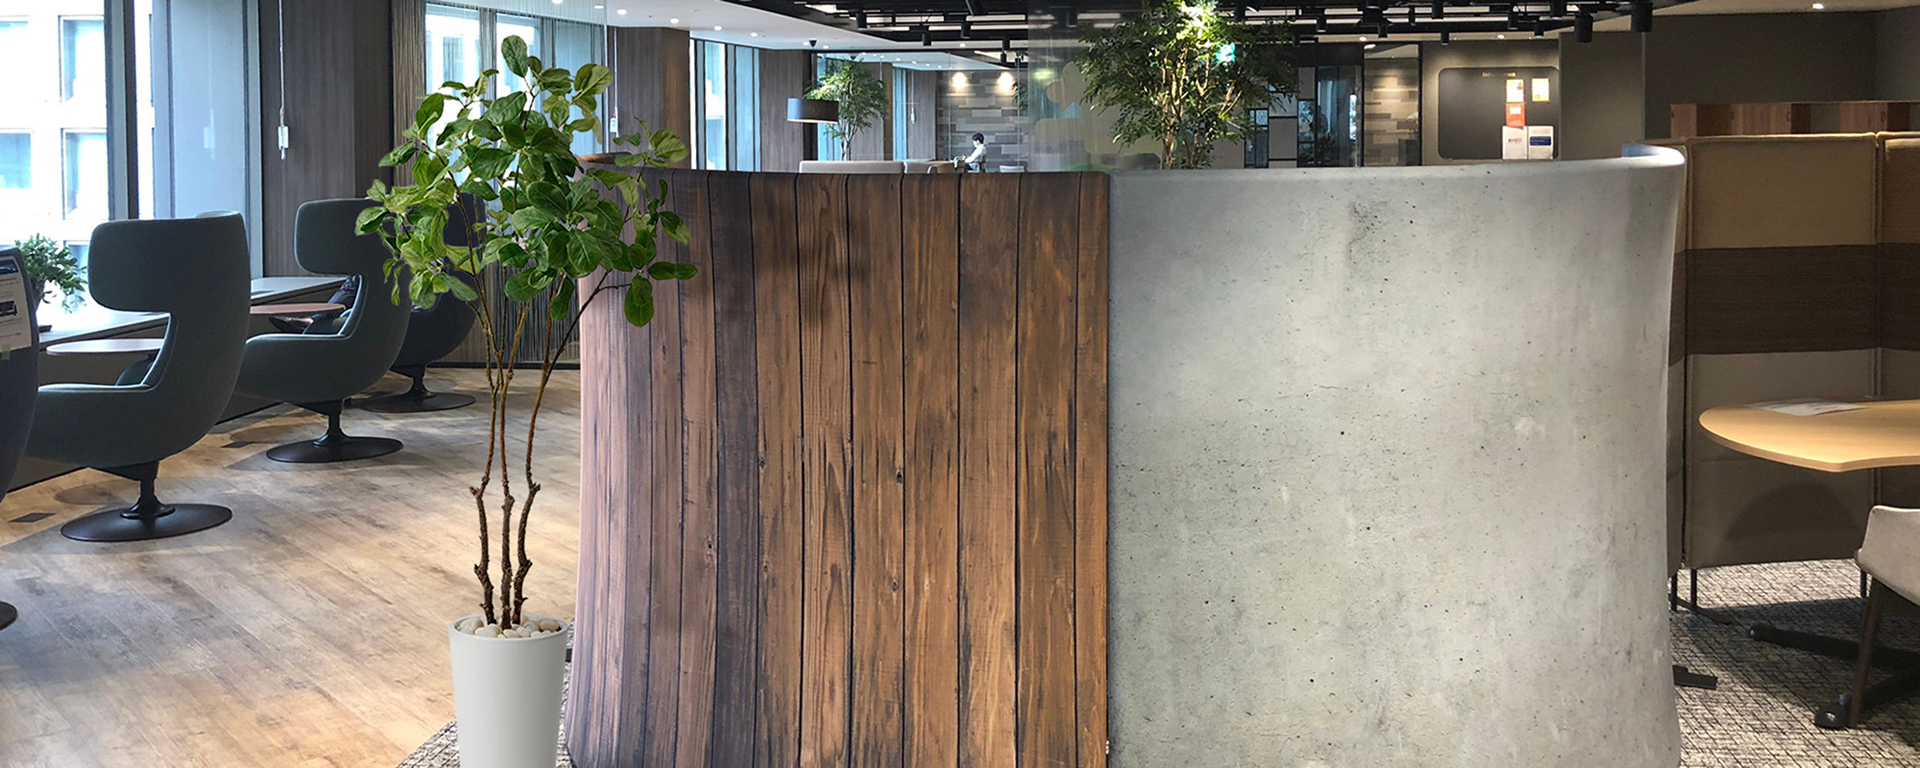 onefabrica「内装リノベーション」イメージ